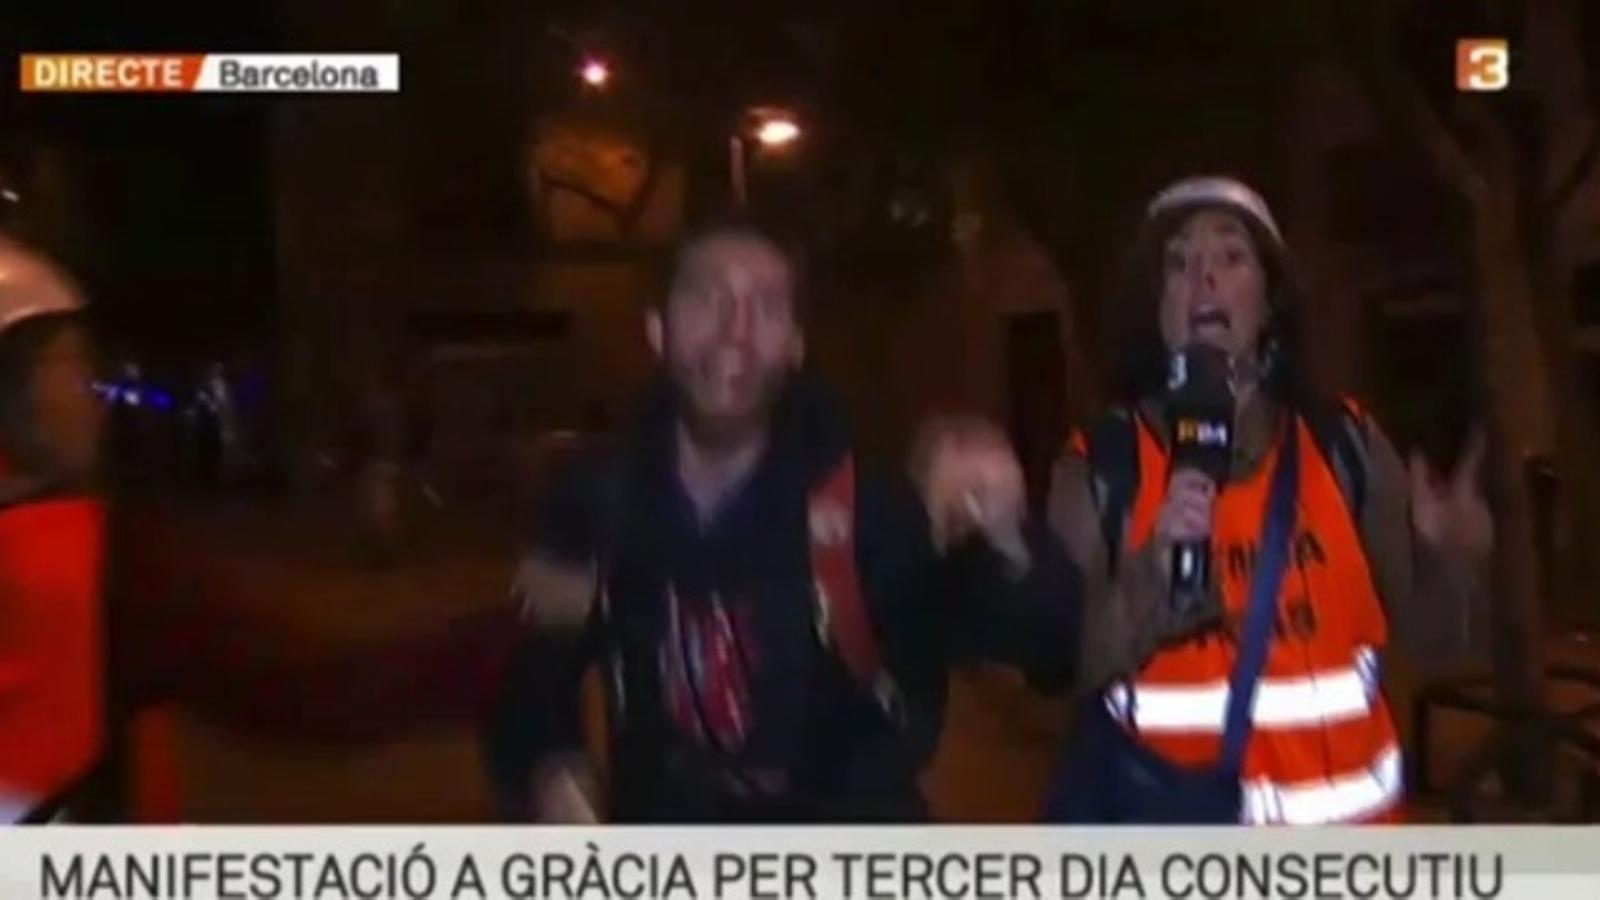 Una reportera de TV3, increpada a Gràcia